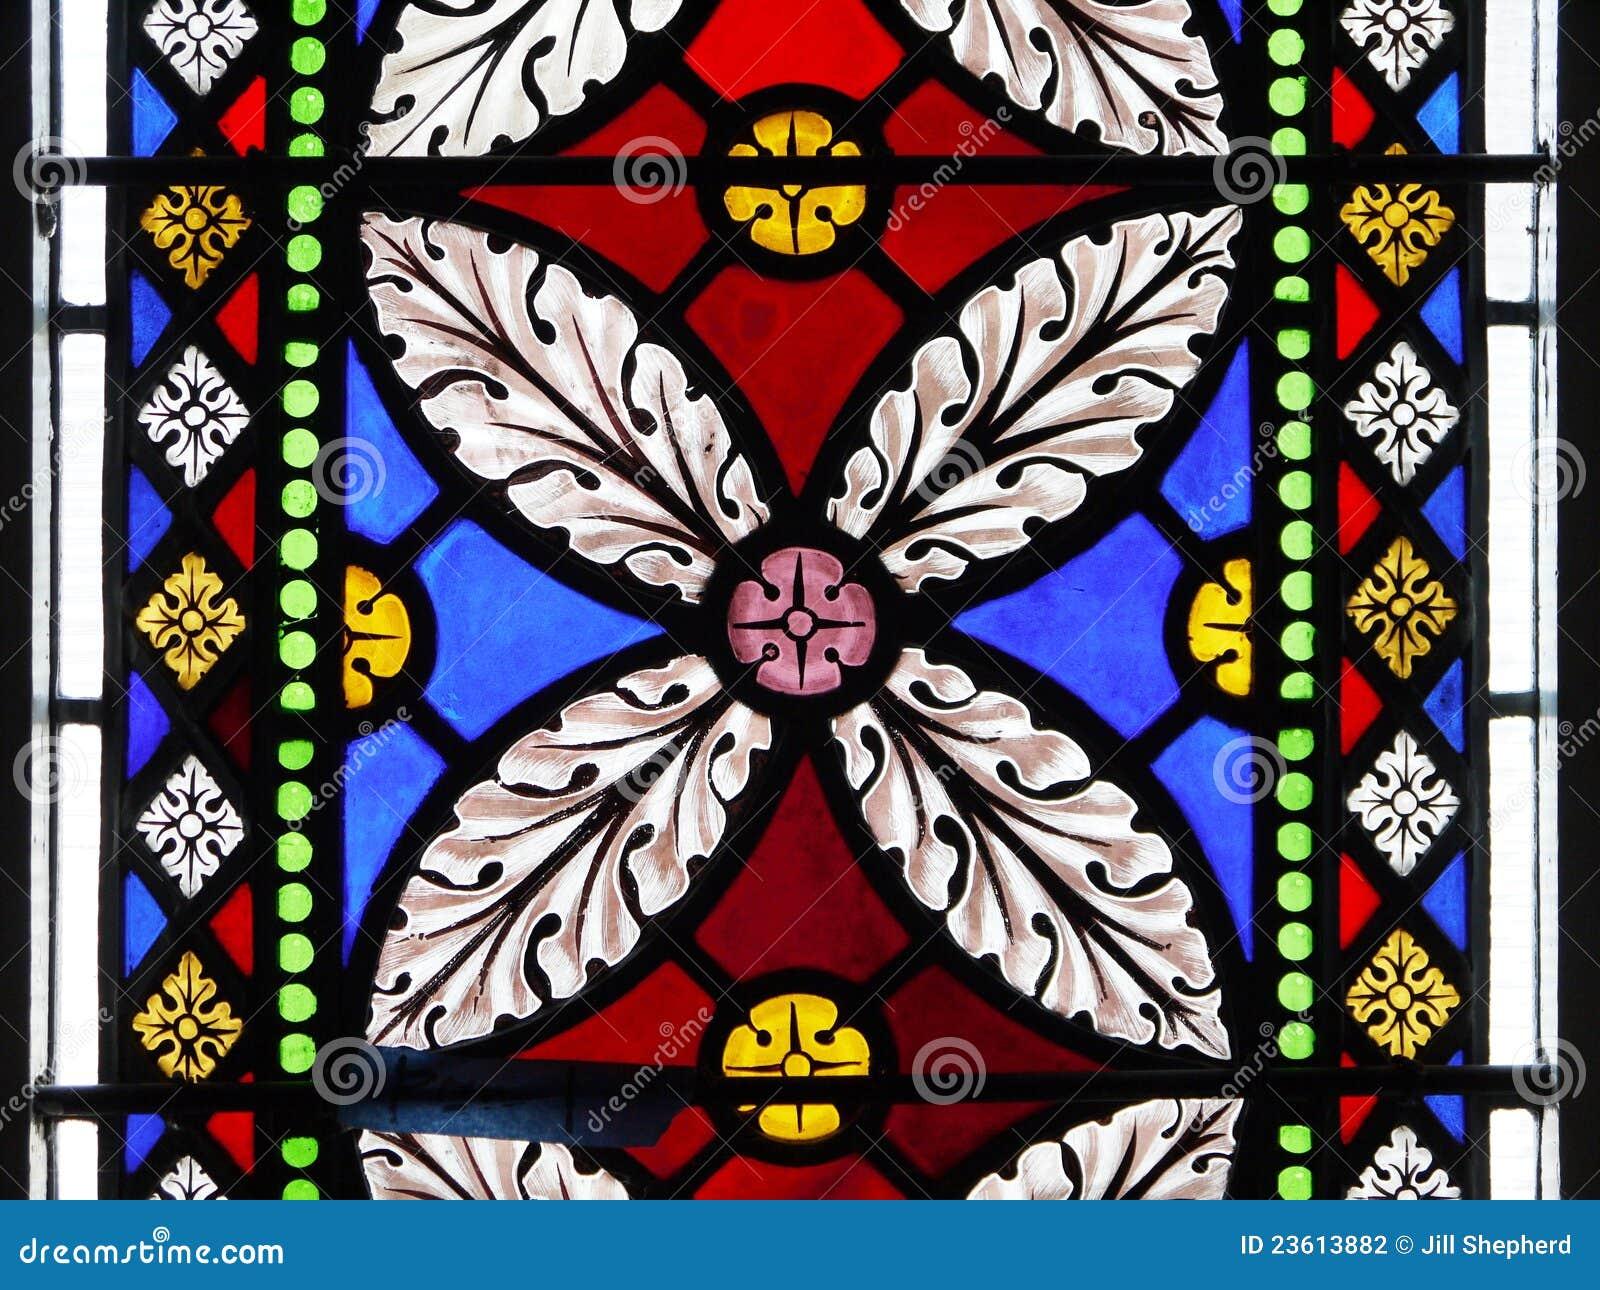 Glass window design - Design Flower Glass Leaf Petal Stained Window